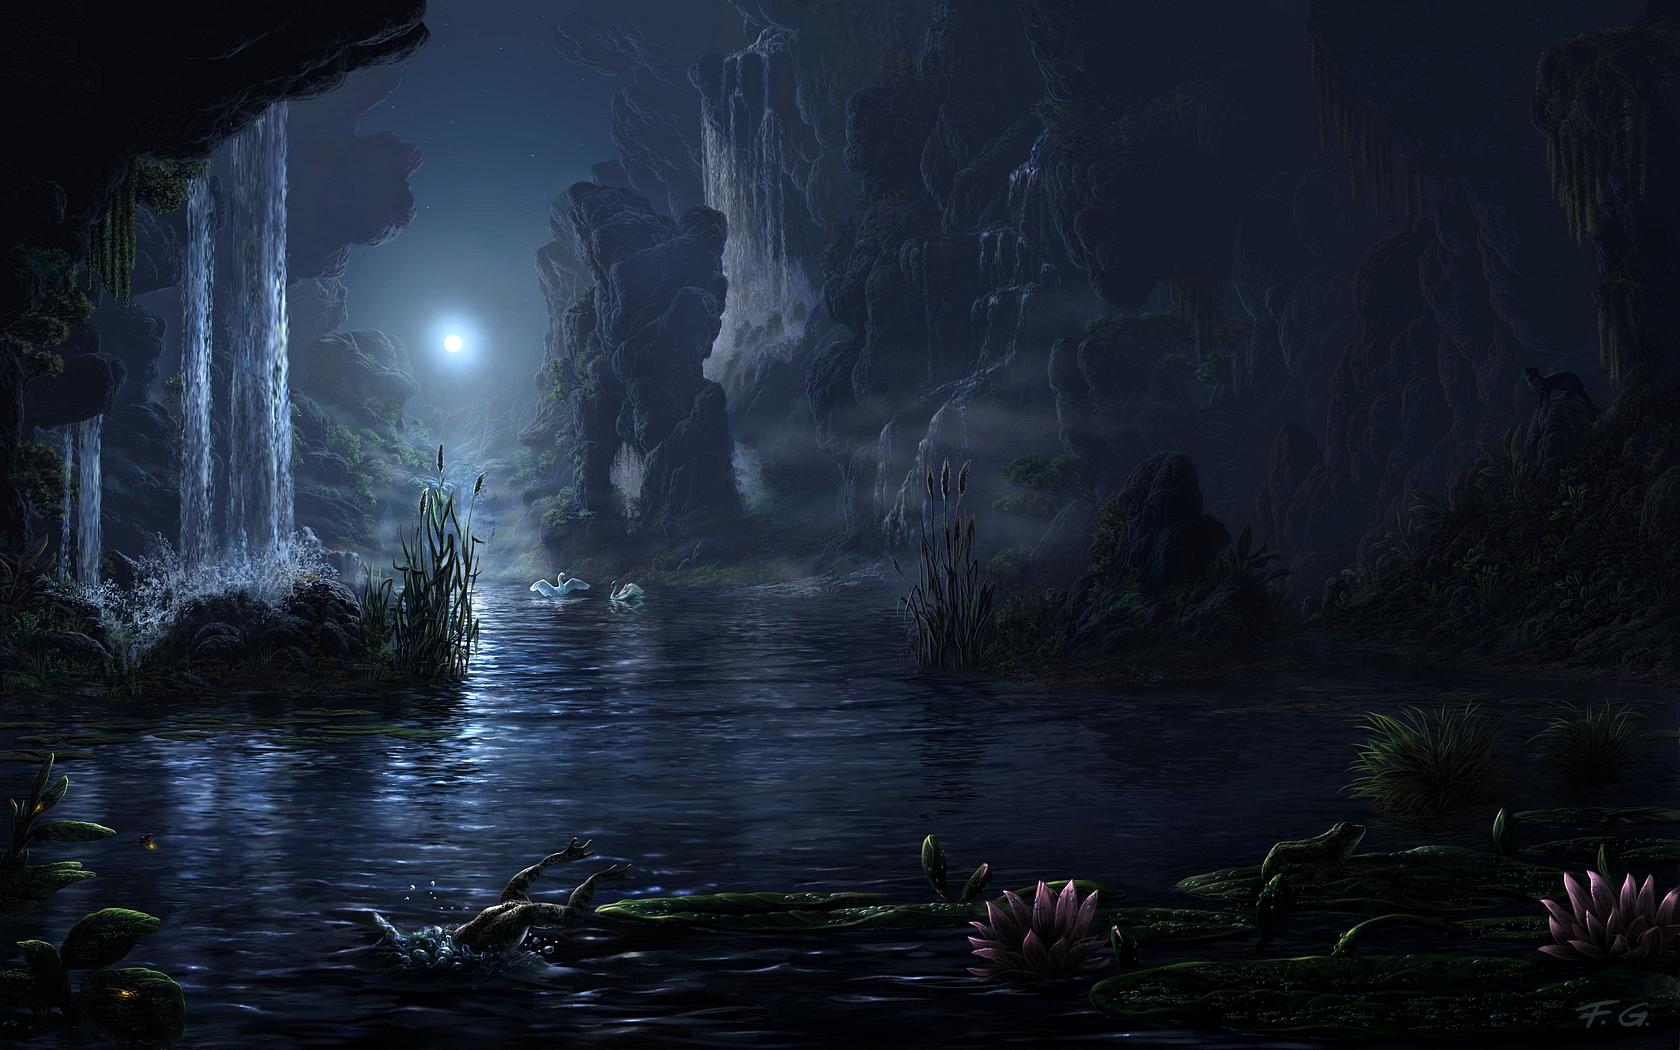 fantasy landscape favourites by thaiha1509 on DeviantArt for Fantasy Water Landscape  174mzq